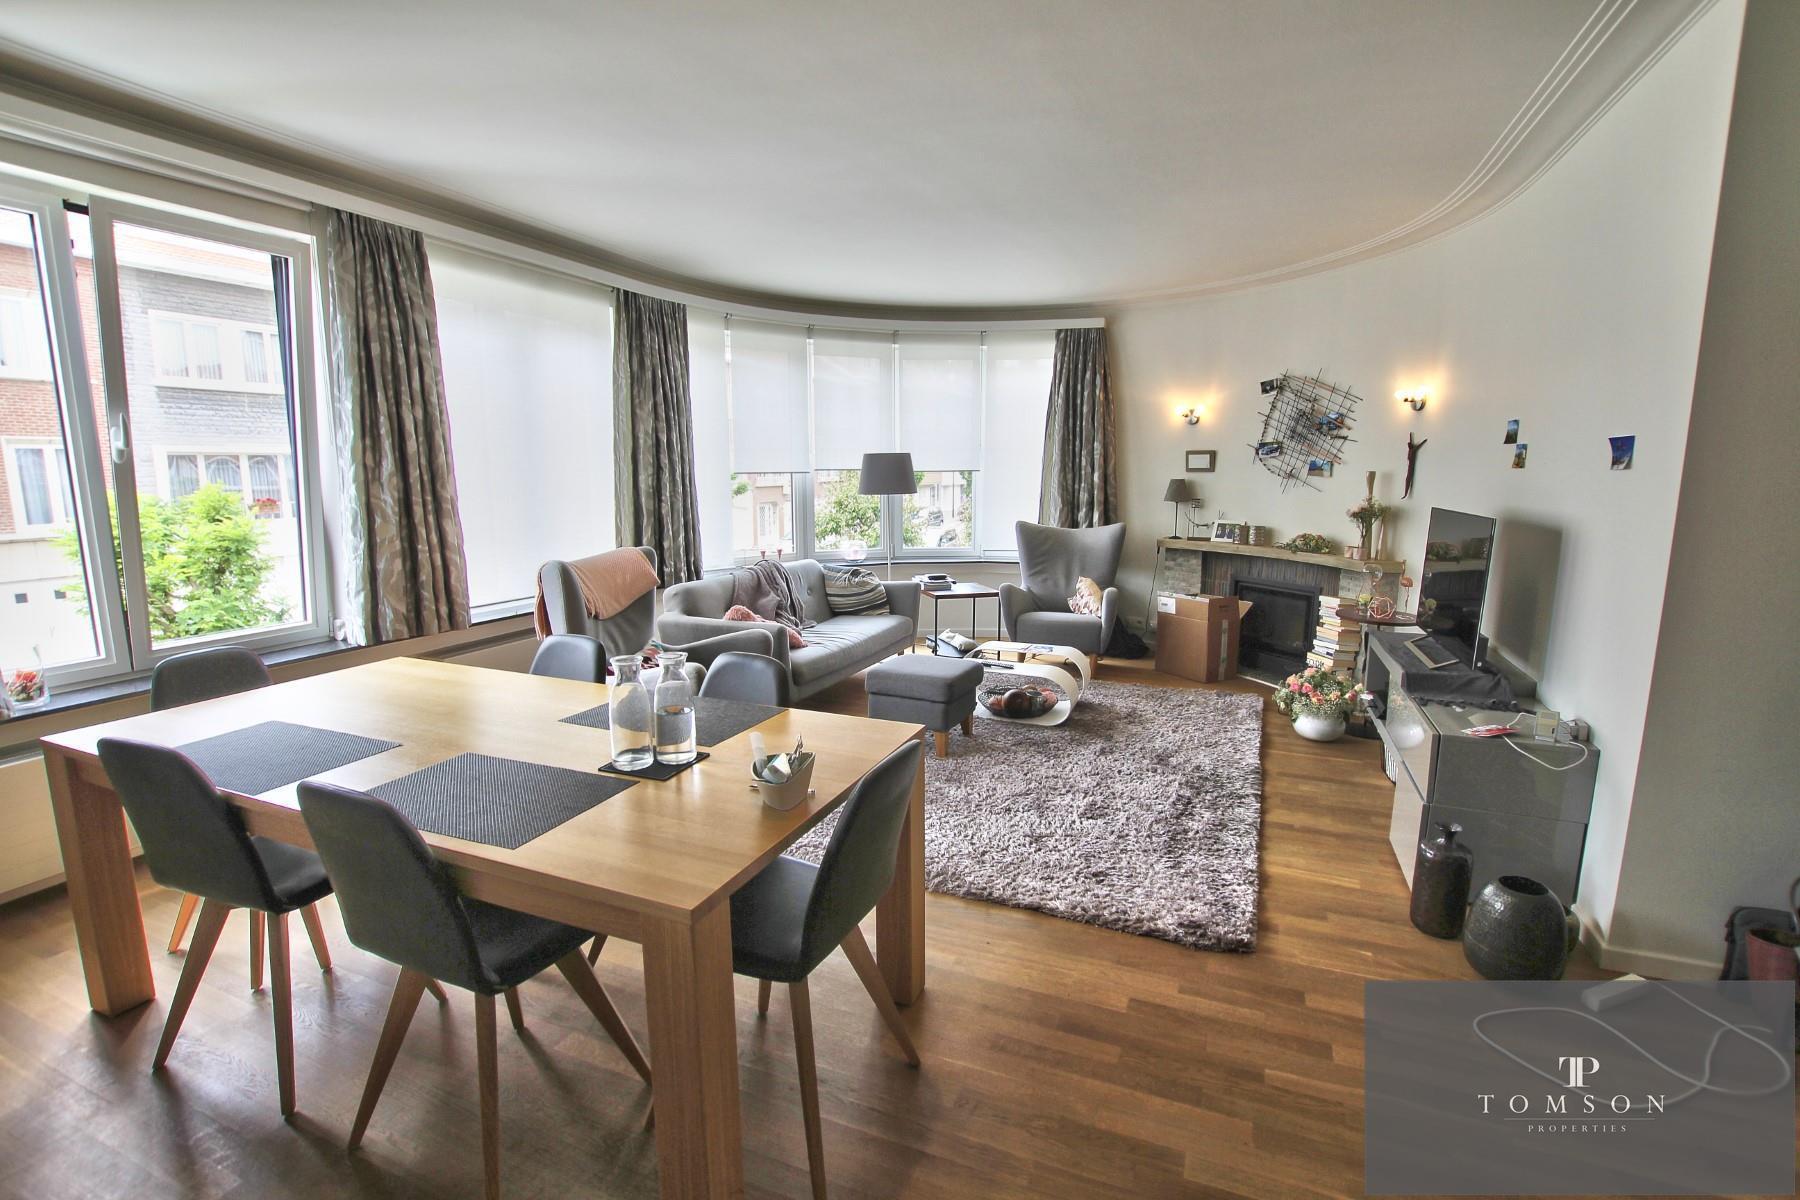 Appartement exceptionnel - Woluwe-Saint-Pierre - #4324789-1